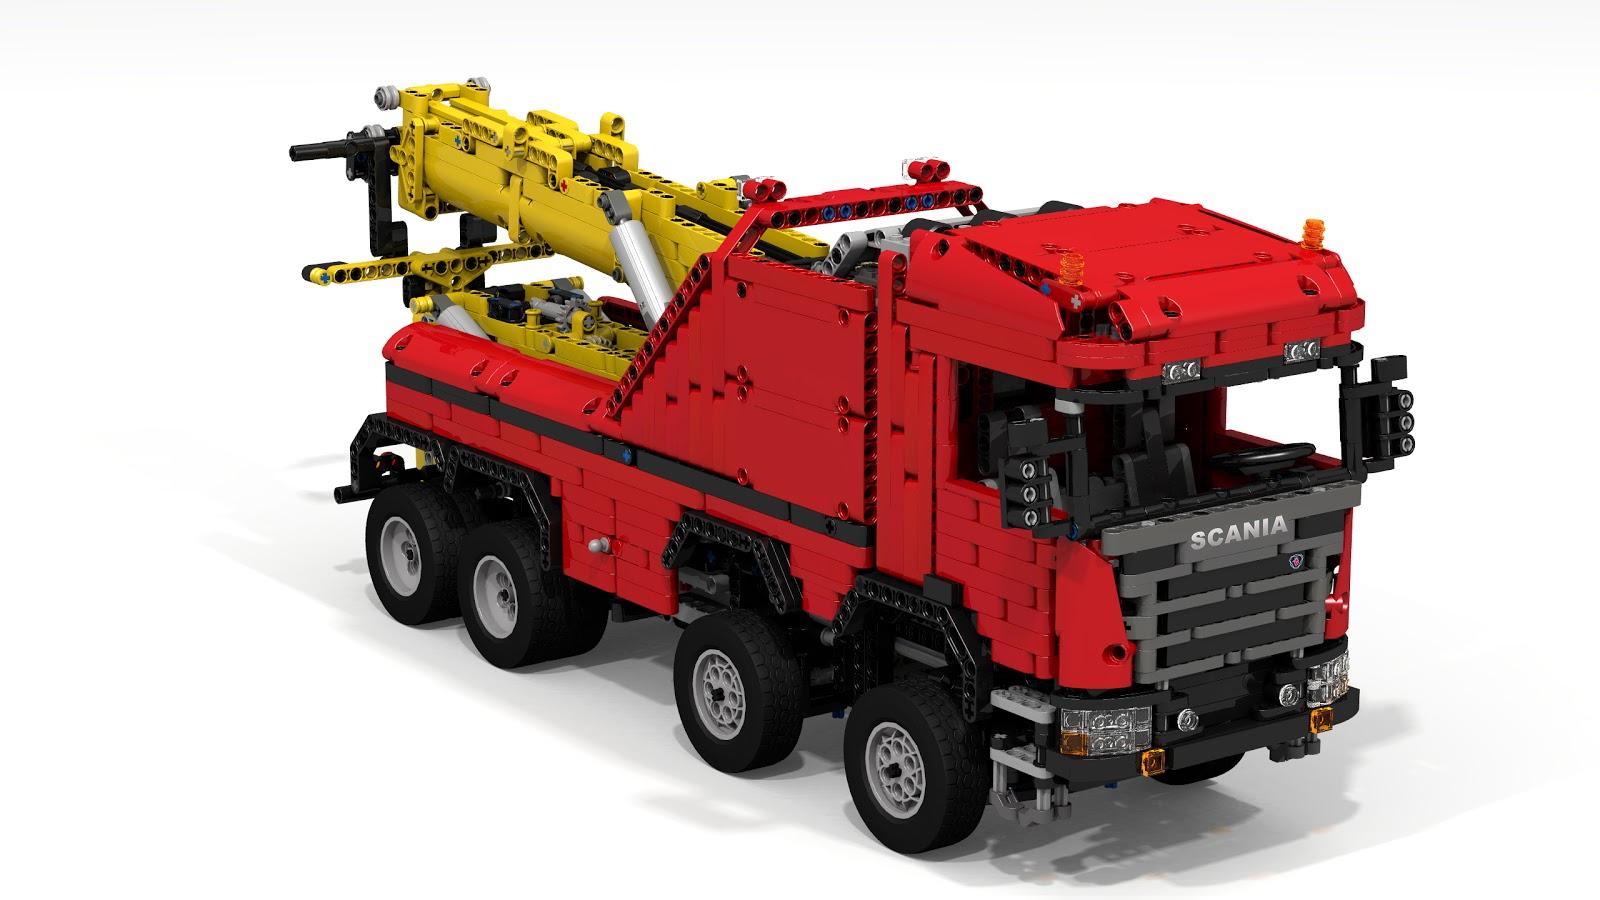 Scania Tow Truck Wrecker Jaaptechnic